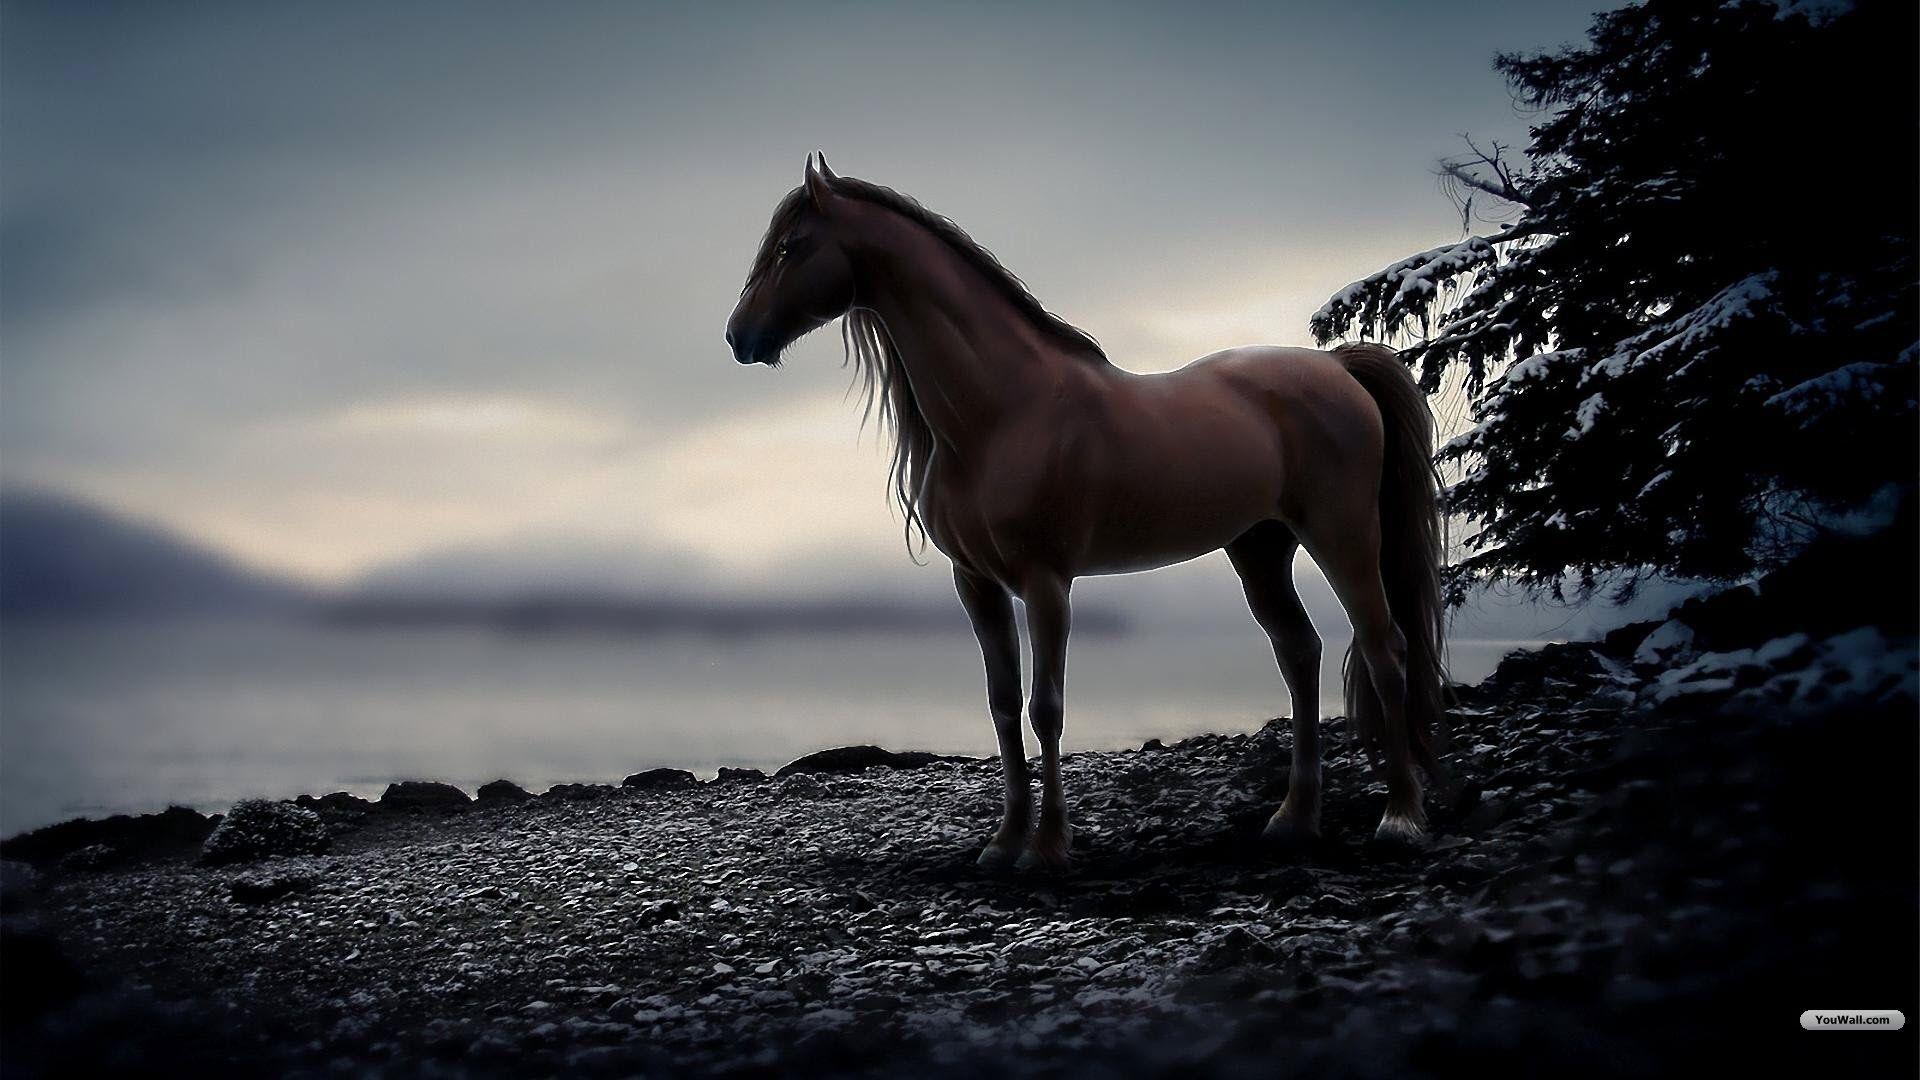 Beautiful Wallpaper Horse Desktop Background - 41e8365b905c4875597cd35d5f0539a3  You Should Have_485685.jpg